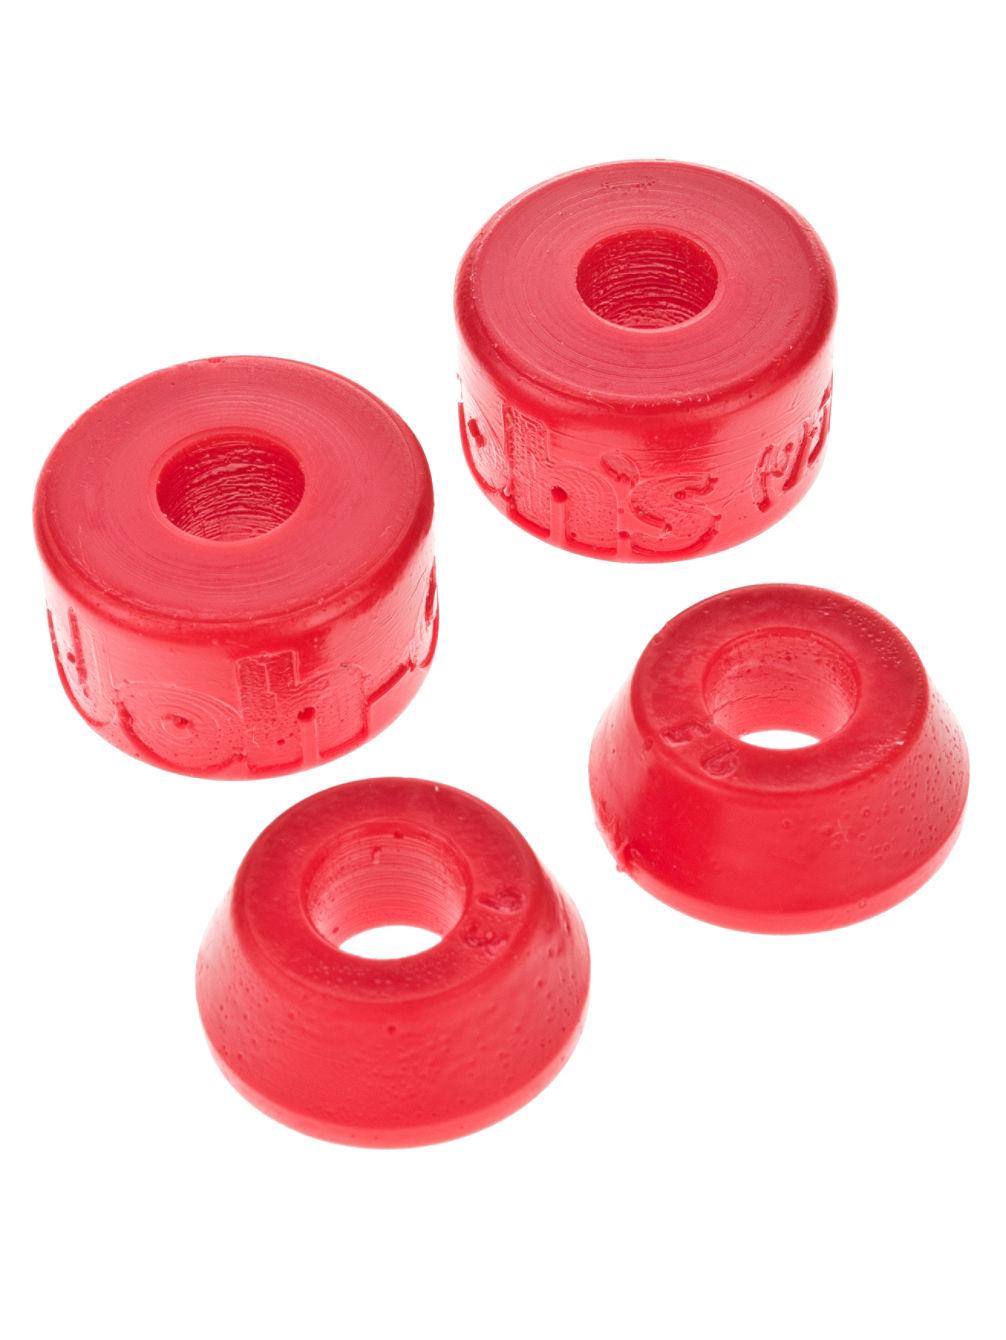 doh-doh-95a-red-set-bushing